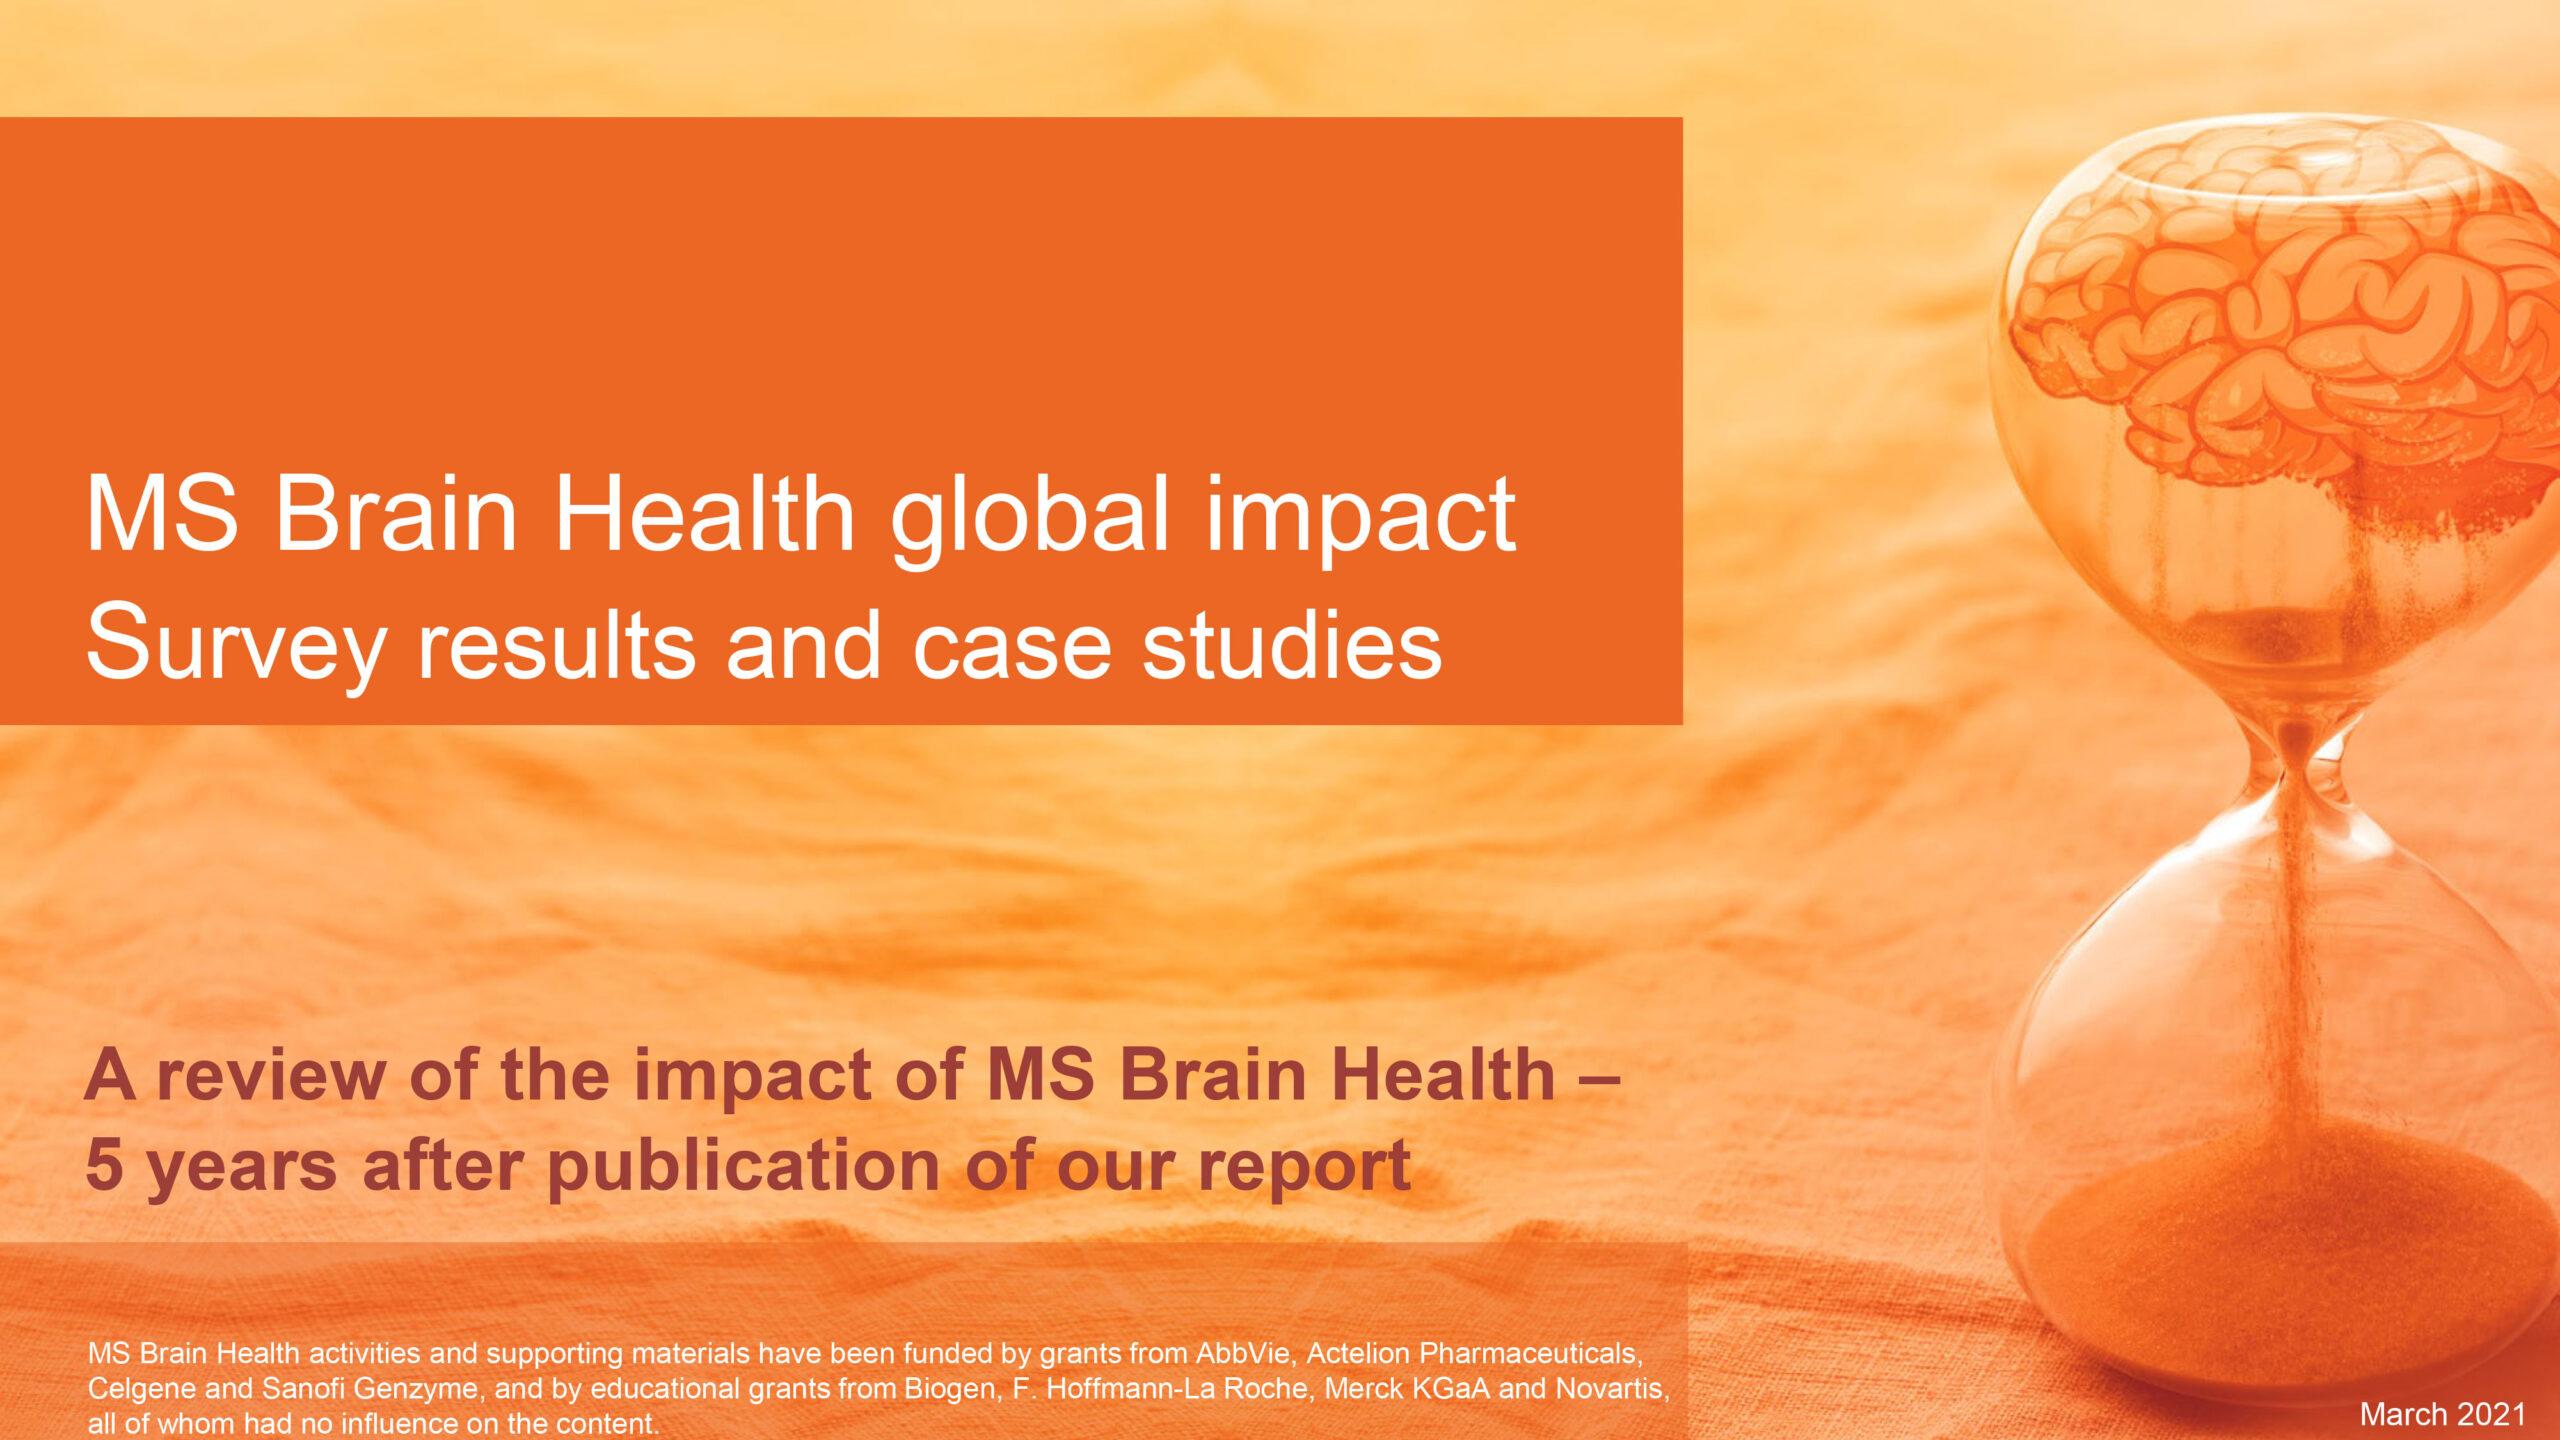 ms-brain-health-global-impact-slides-5-1__